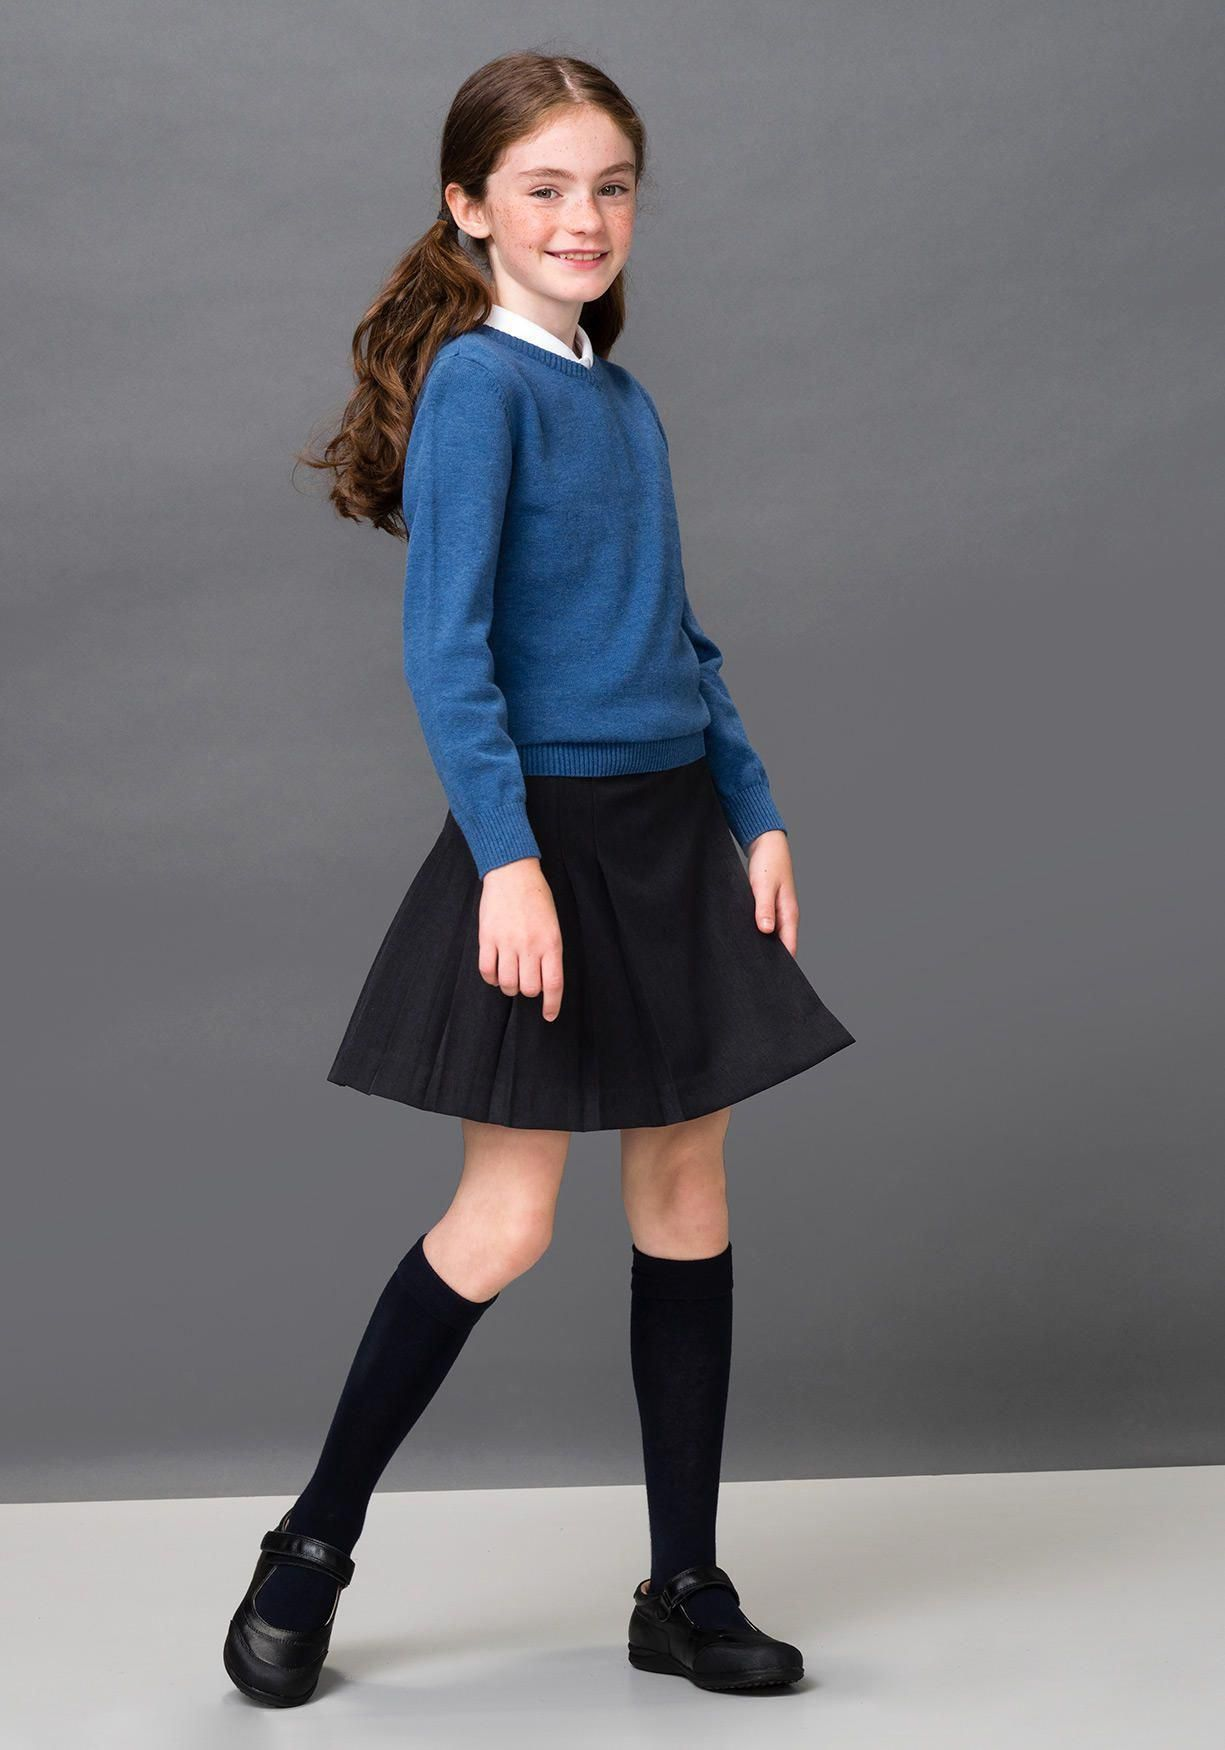 latest fashion dresses teenage